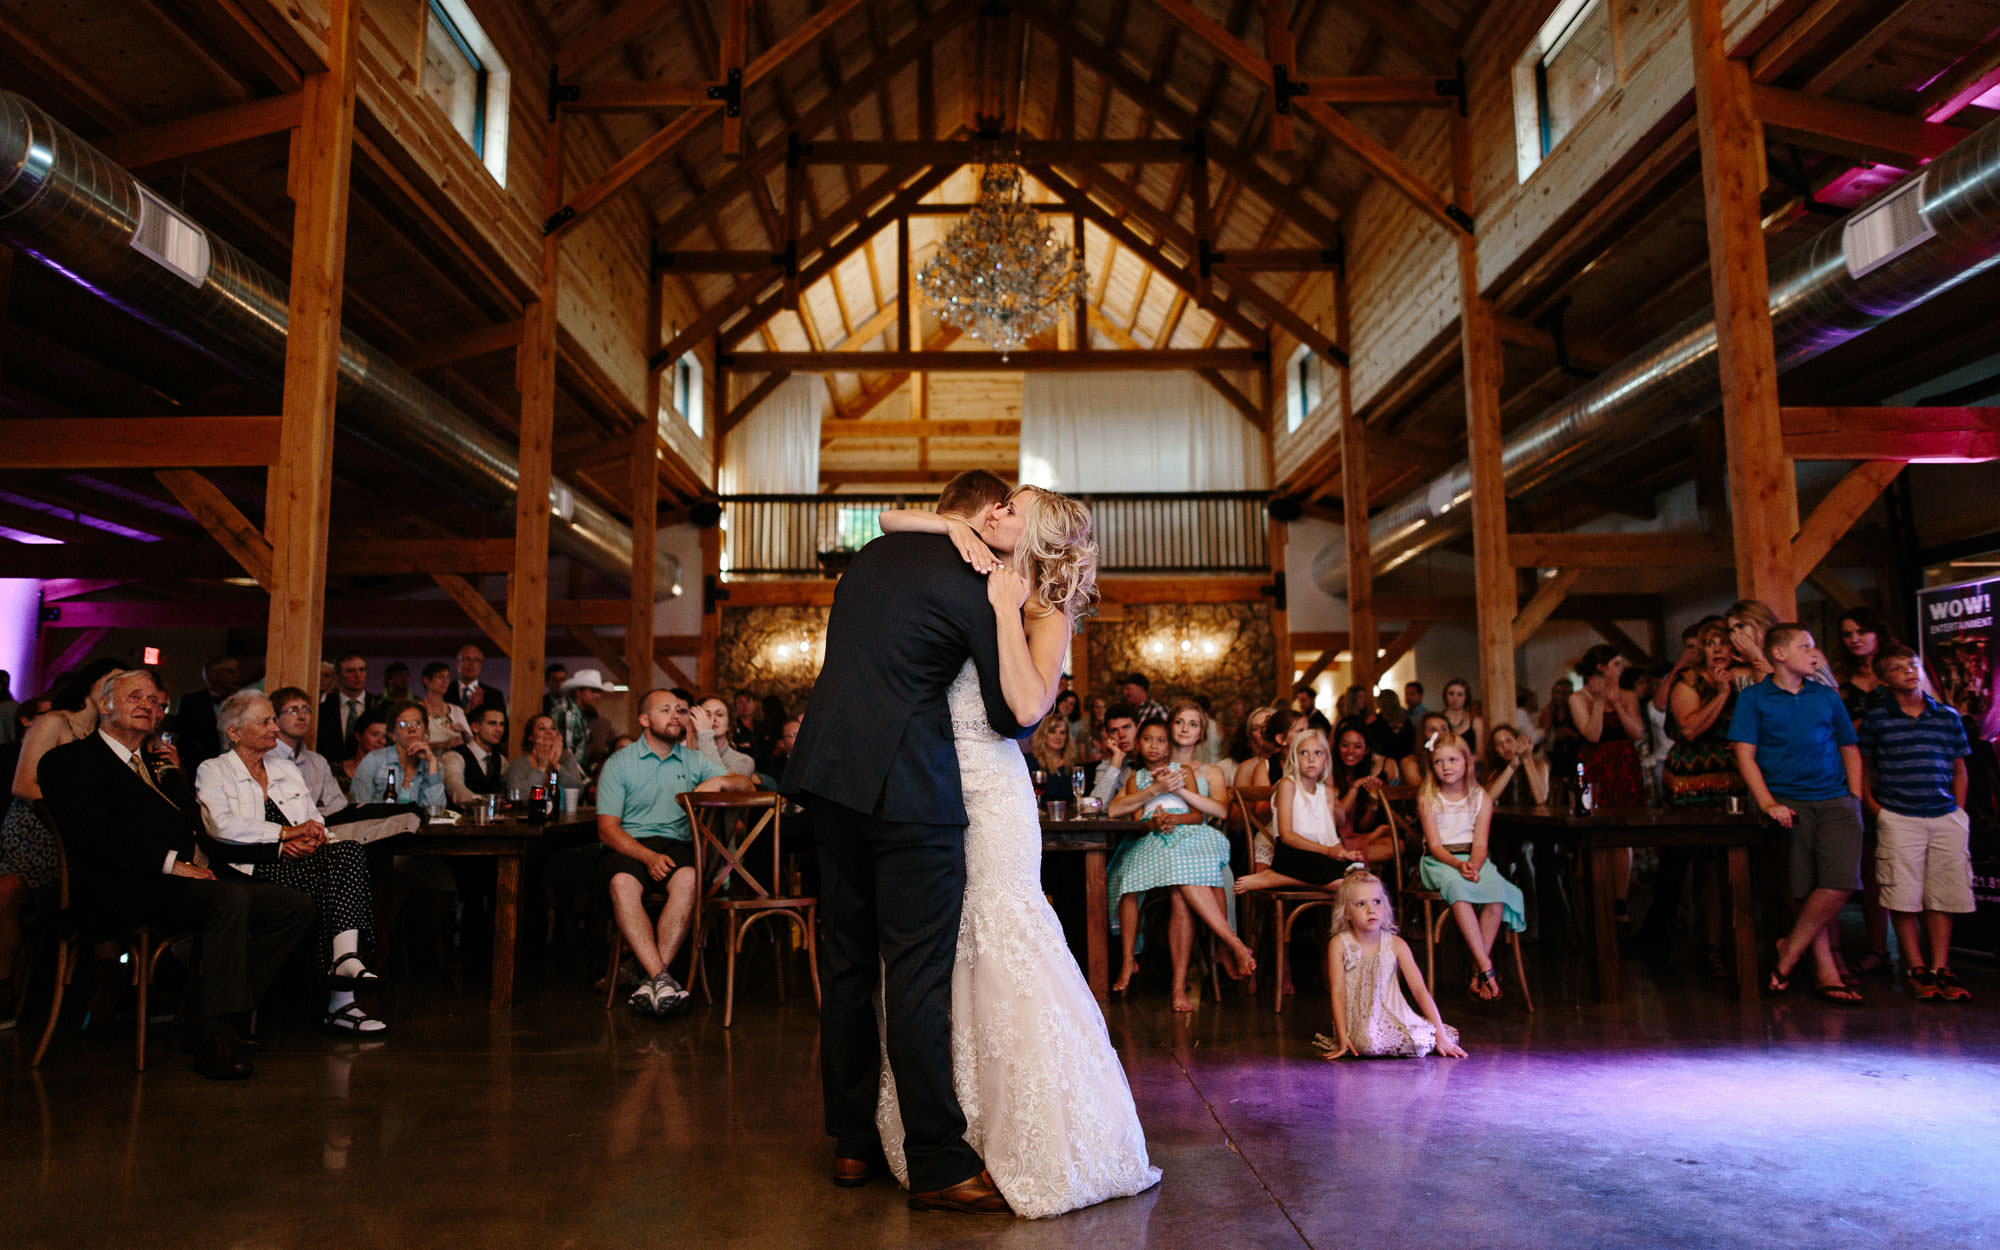 meadow-barn-wedding-sioux-falls-south-dakota-romantic-adventerous-michael-liedtke-photography125.jpg